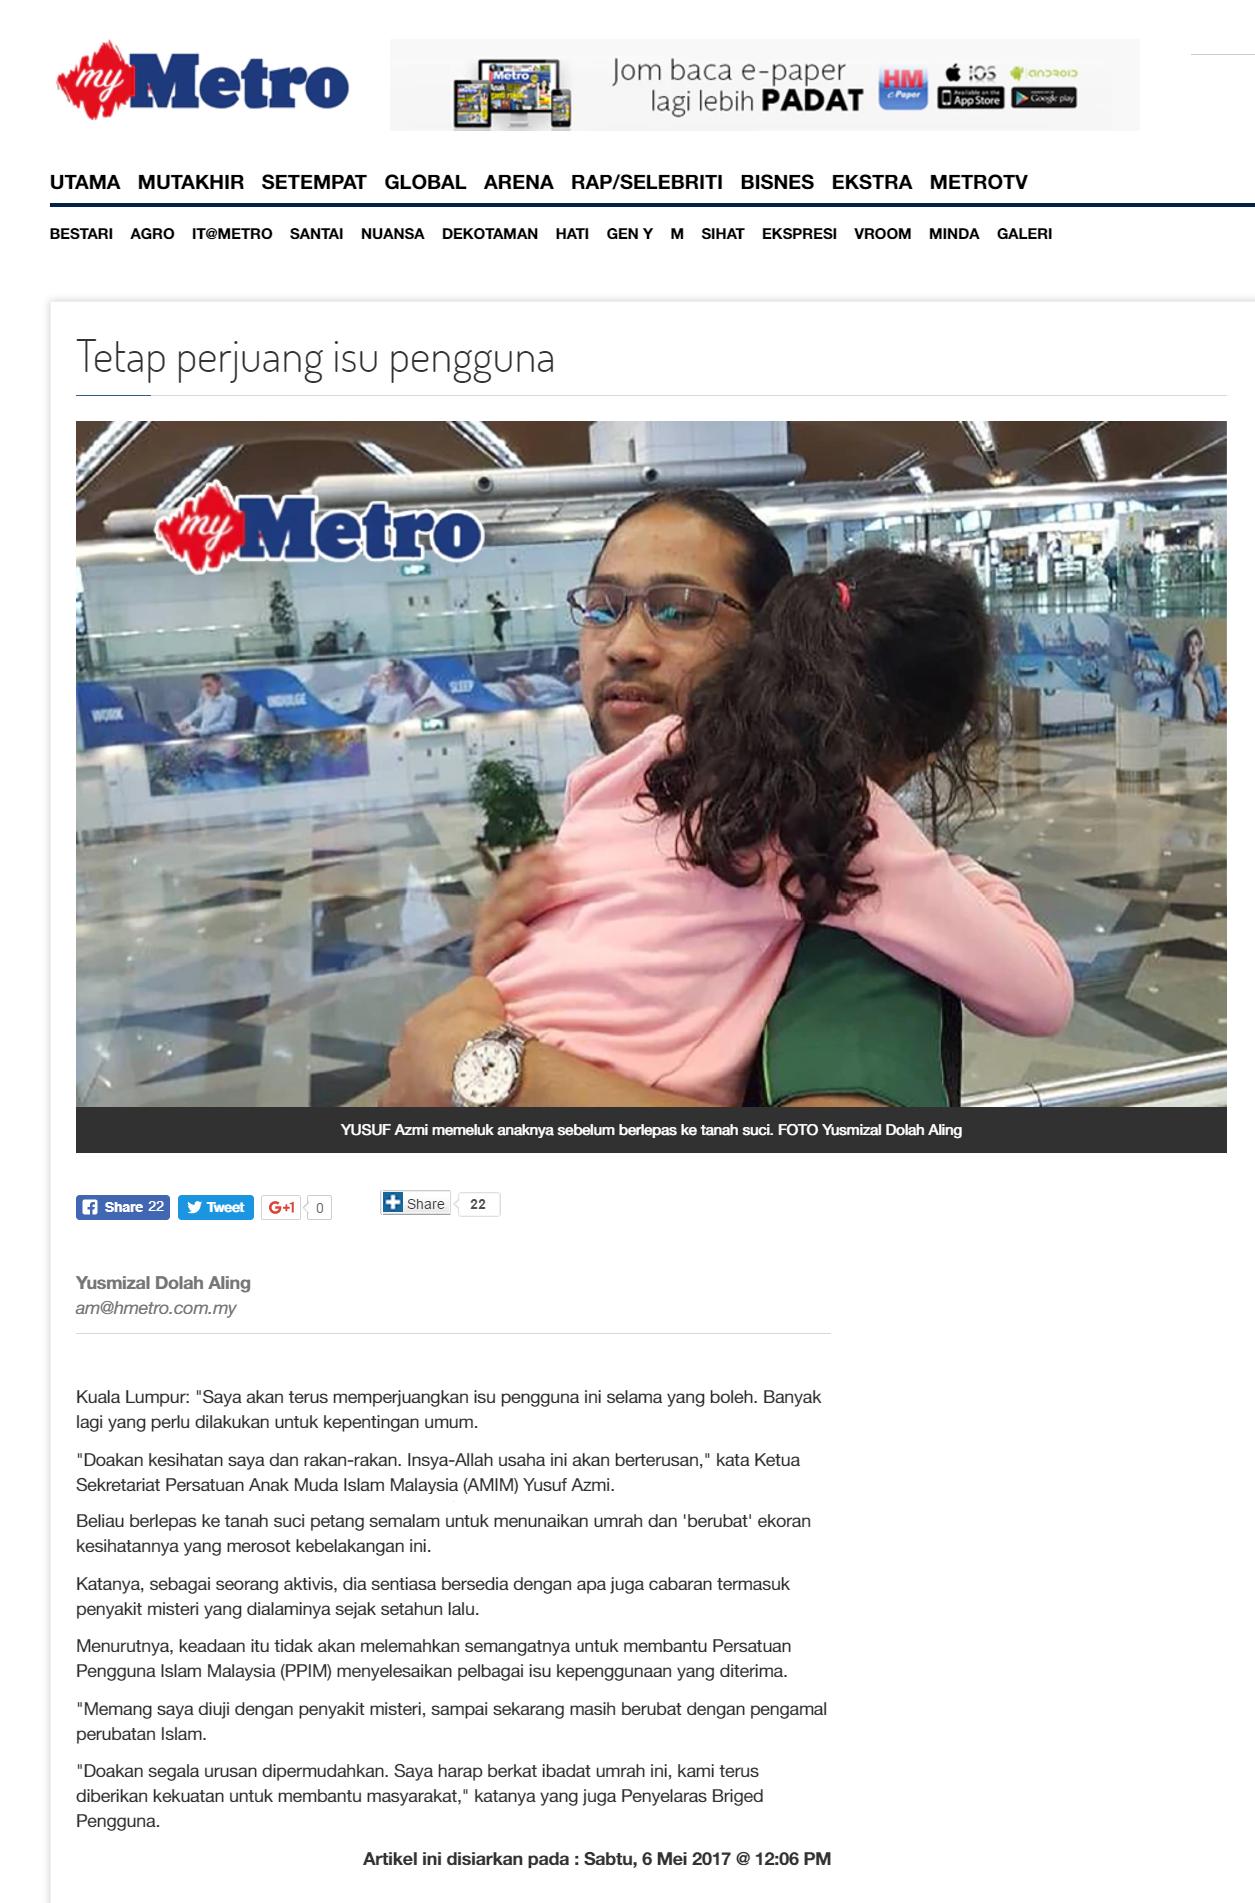 20170506 - Harian Metro Online - Aktiviti - Tetap perjuang isu pengguna